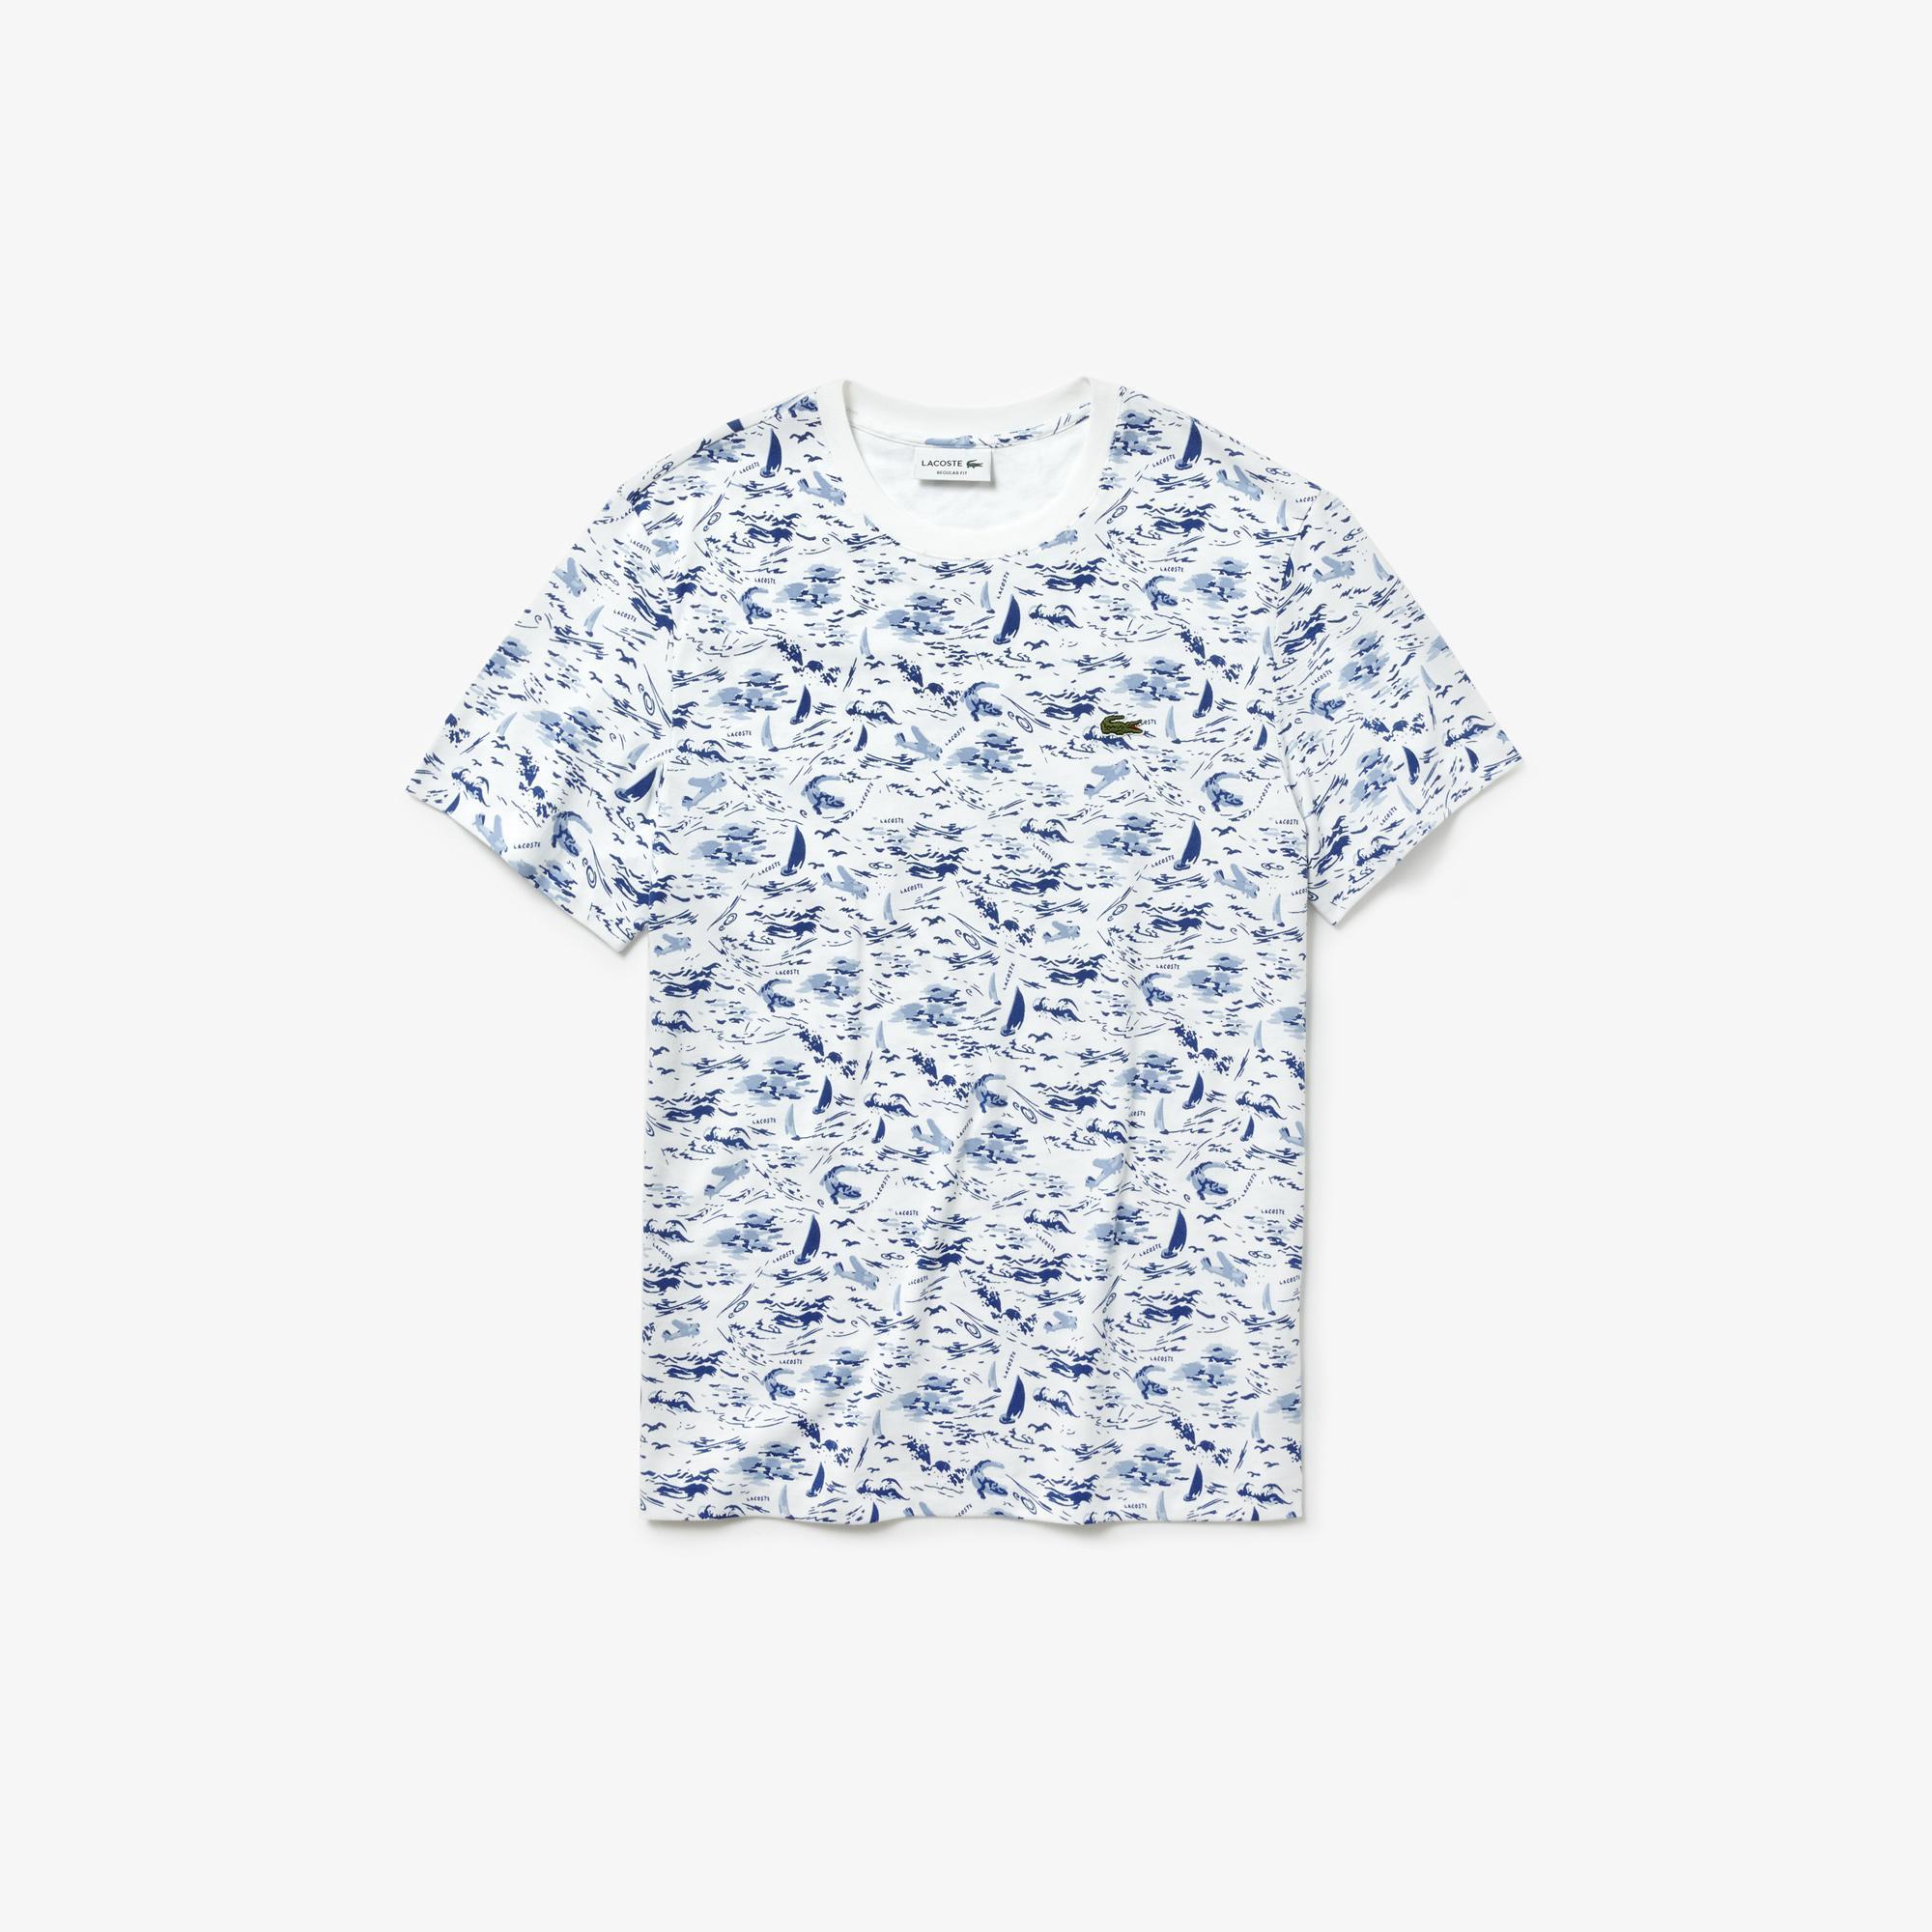 Lacoste Erkek Desenli Beyaz T-Shirt